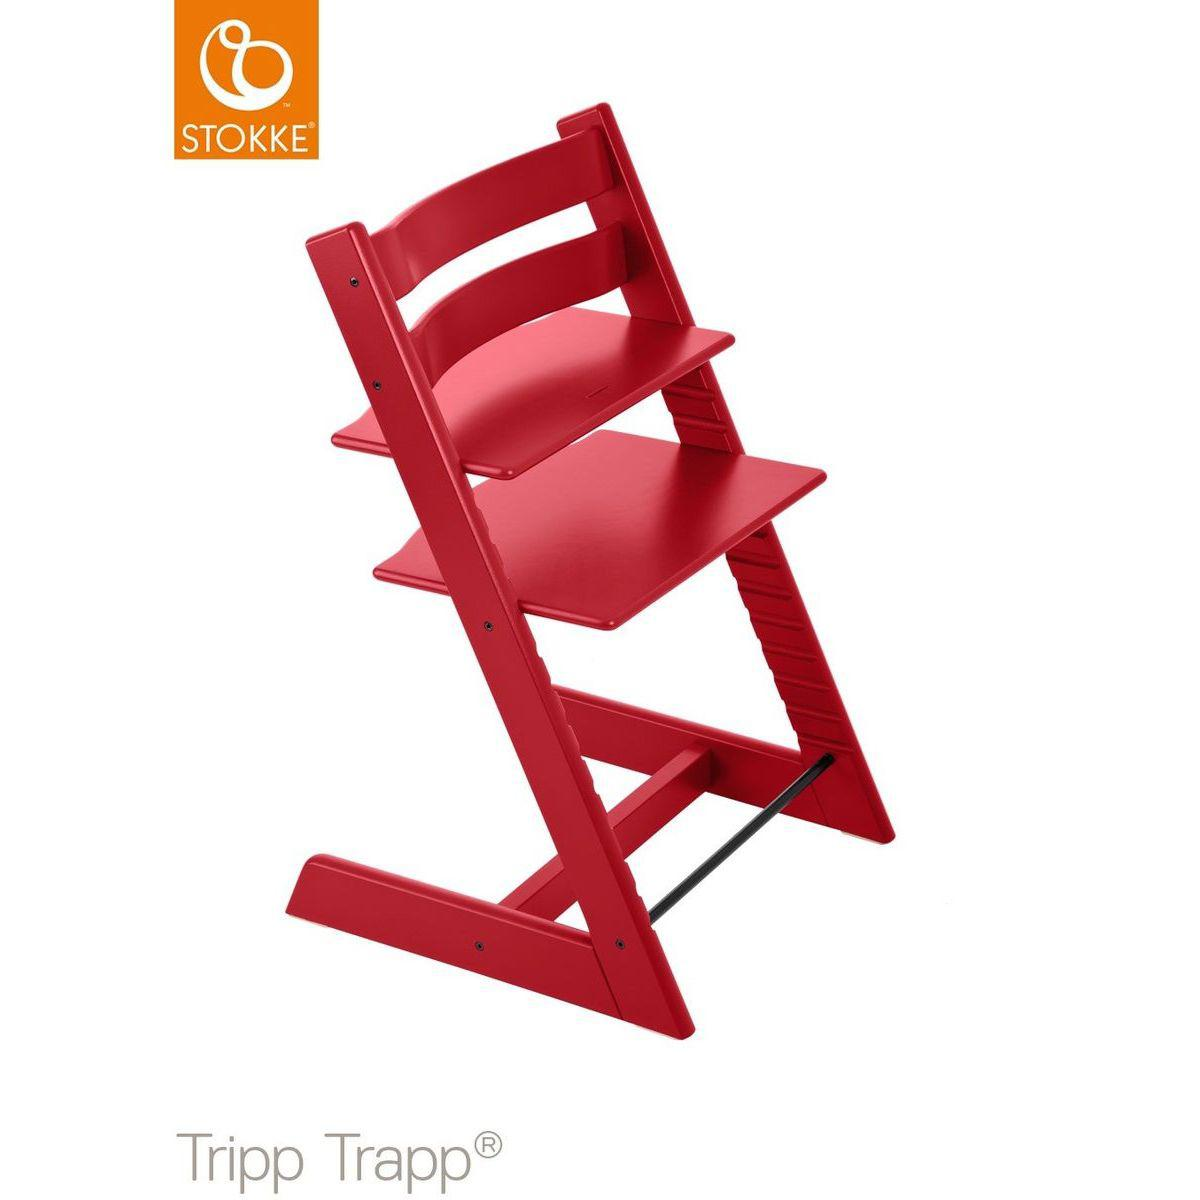 Chaise haute TRIPP TRAPP Stokke rouge